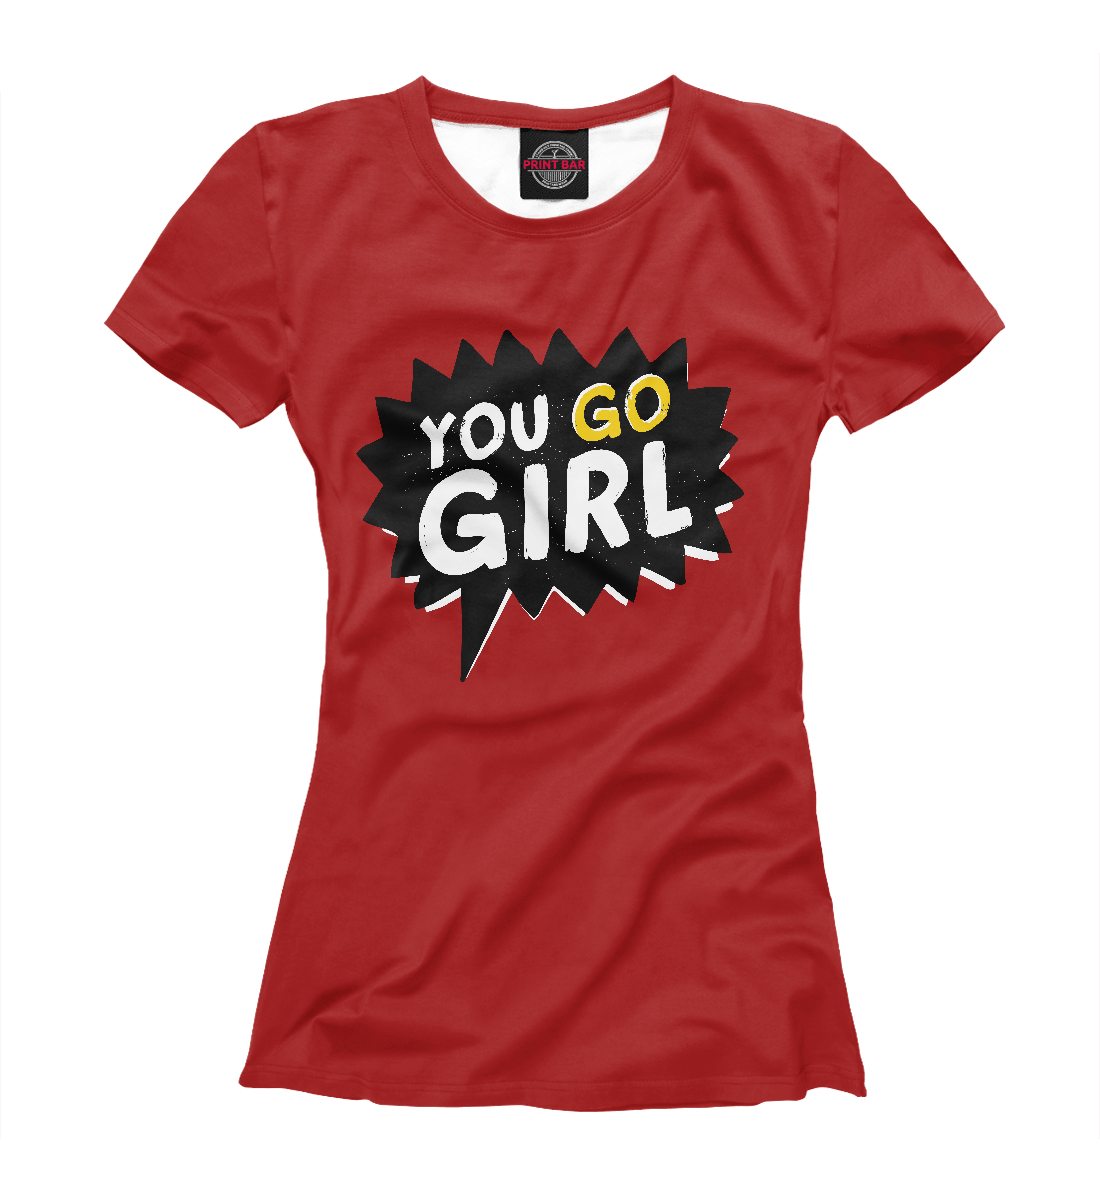 You go girl i fear you girl